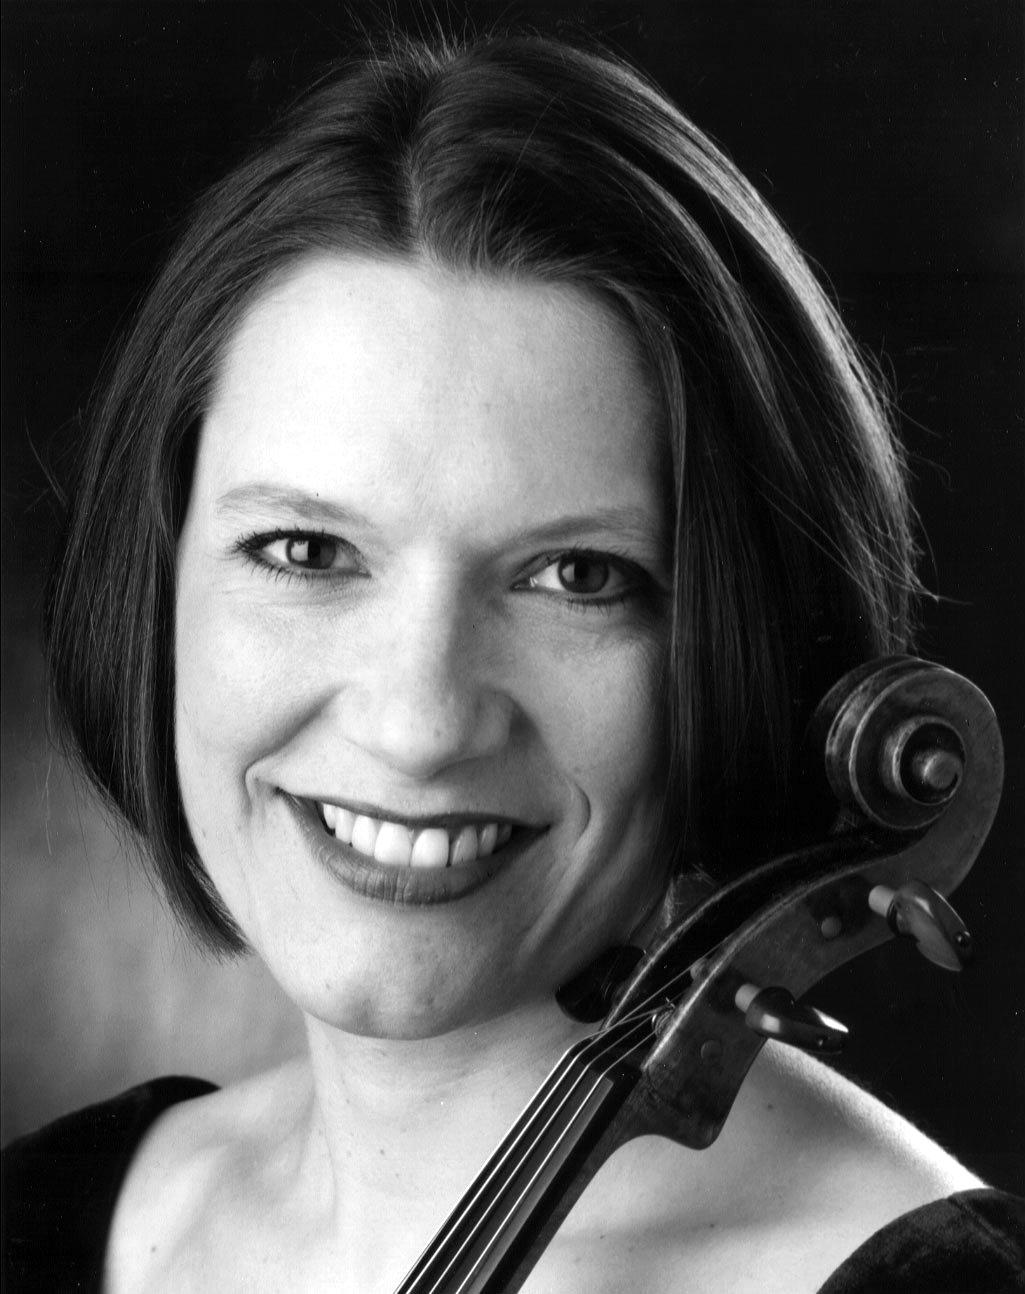 Photo: Erika Eckert, viola (vertical)